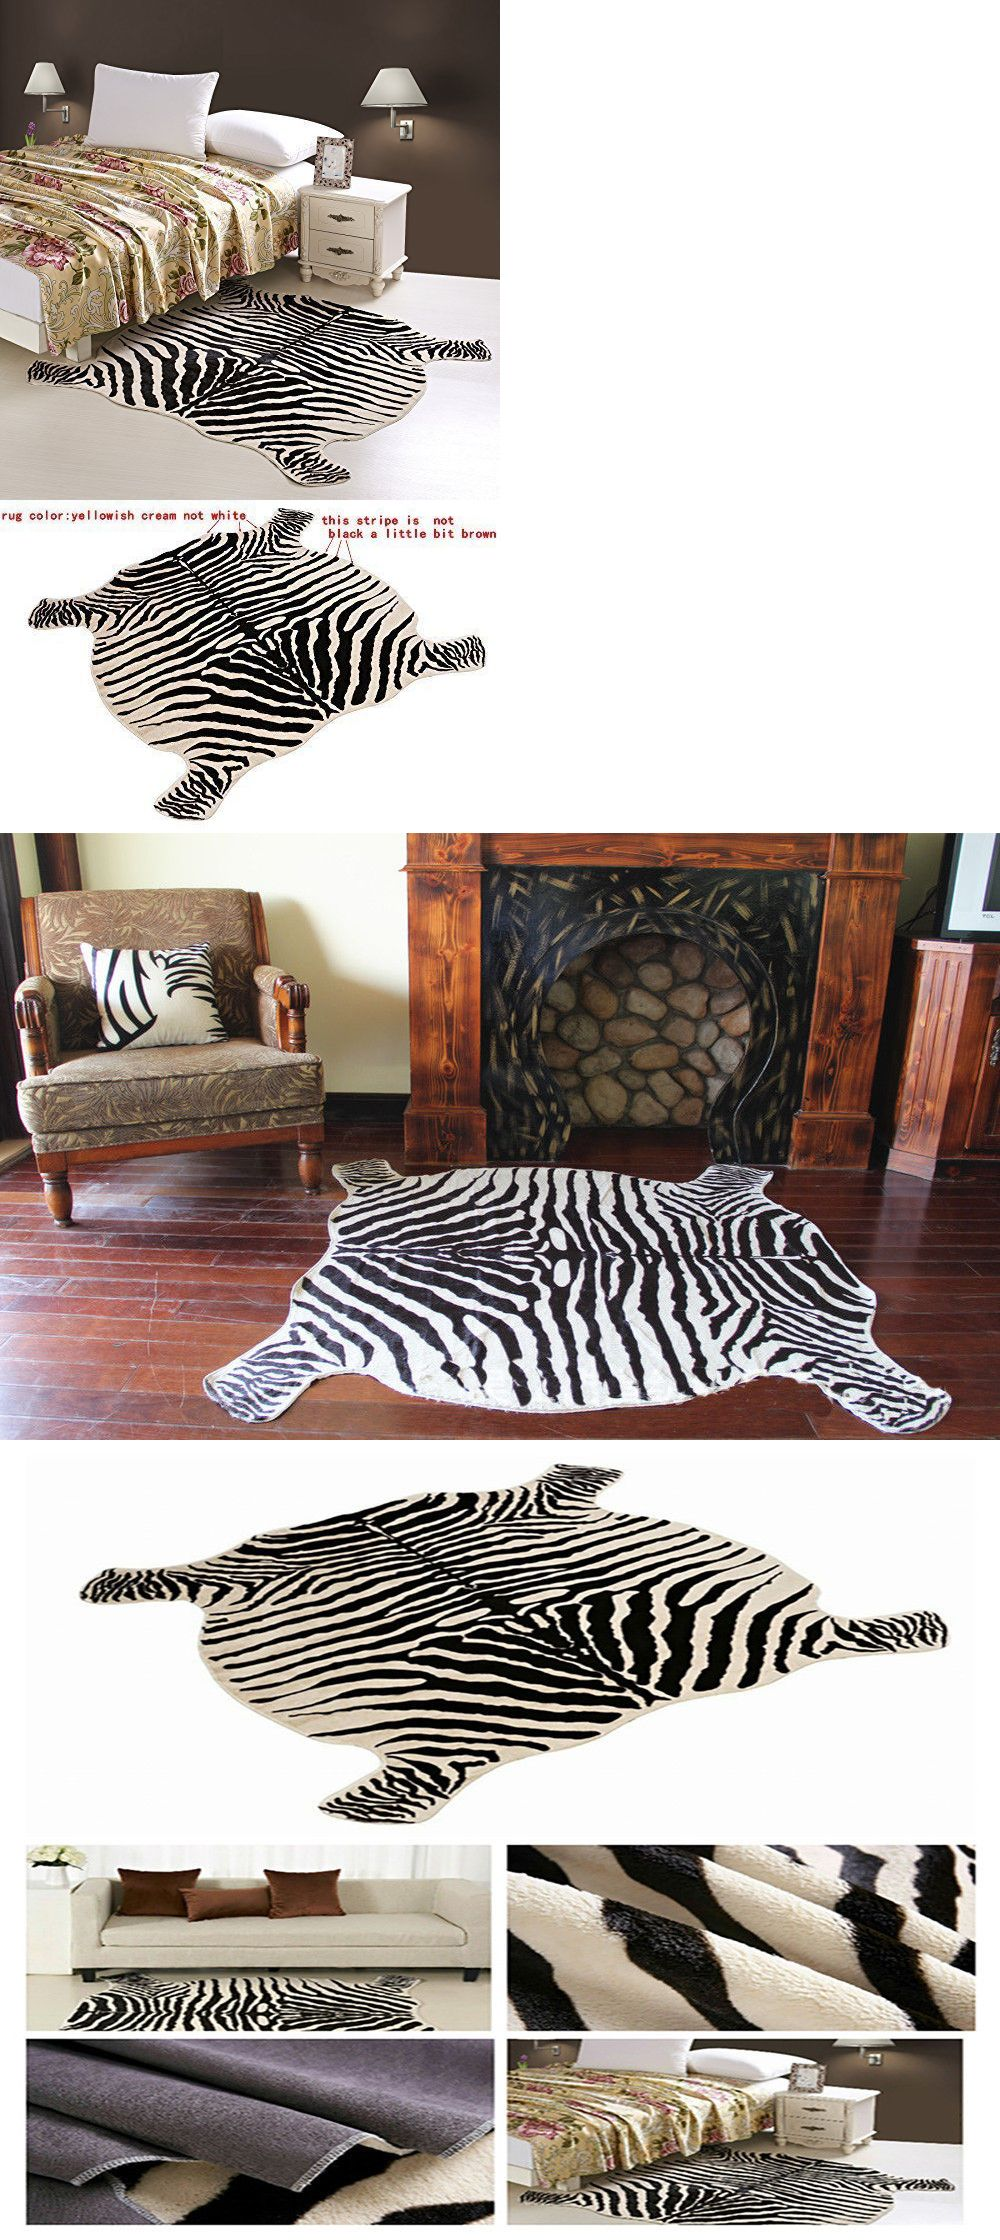 Leather Fur And Sheepskin Rugs 91421 Large Cowhide Rug Faux Zebra Cow Hide Carpet Home 4 8x4 9 Feet Anima Large Cowhide Rug Faux Cowhide Rug Zebra Cowhide Rug